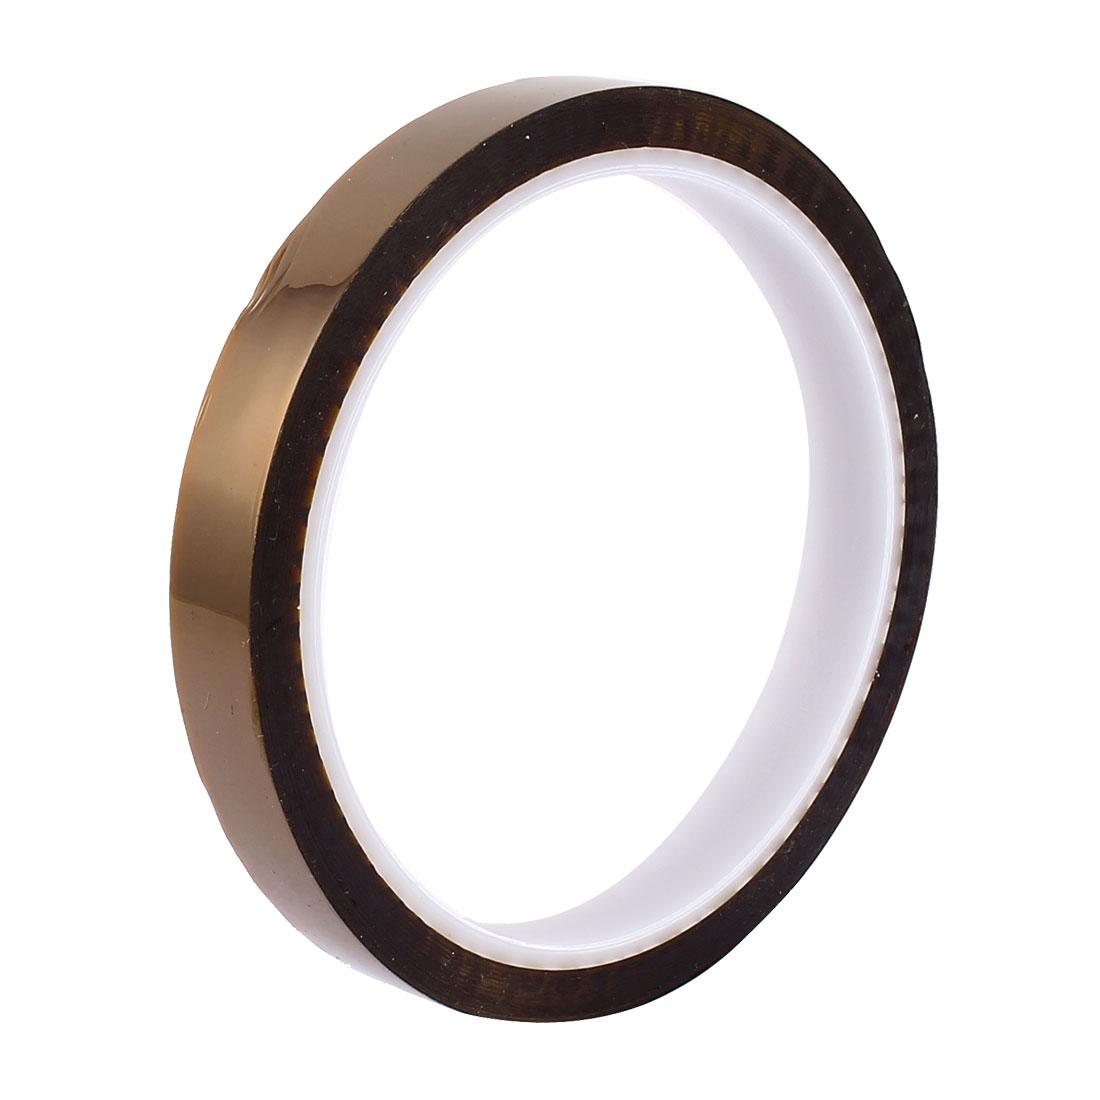 12mm Width 95mm Diameter High Temperature Resistant Tape